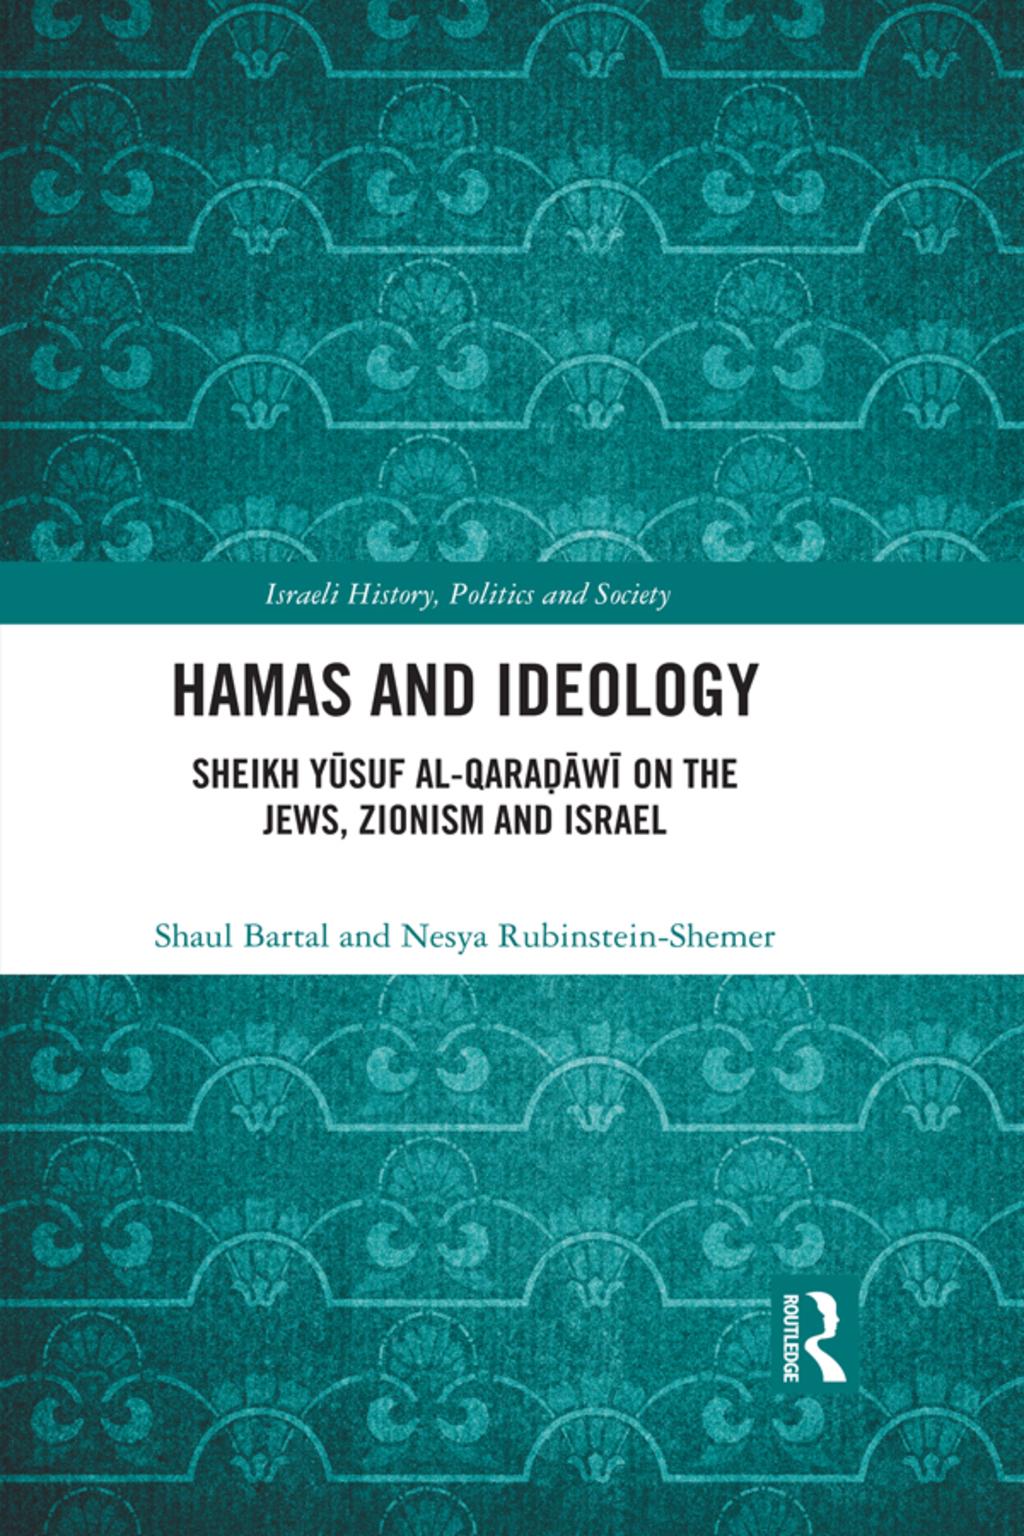 Hamas and Ideology (eBook Rental)